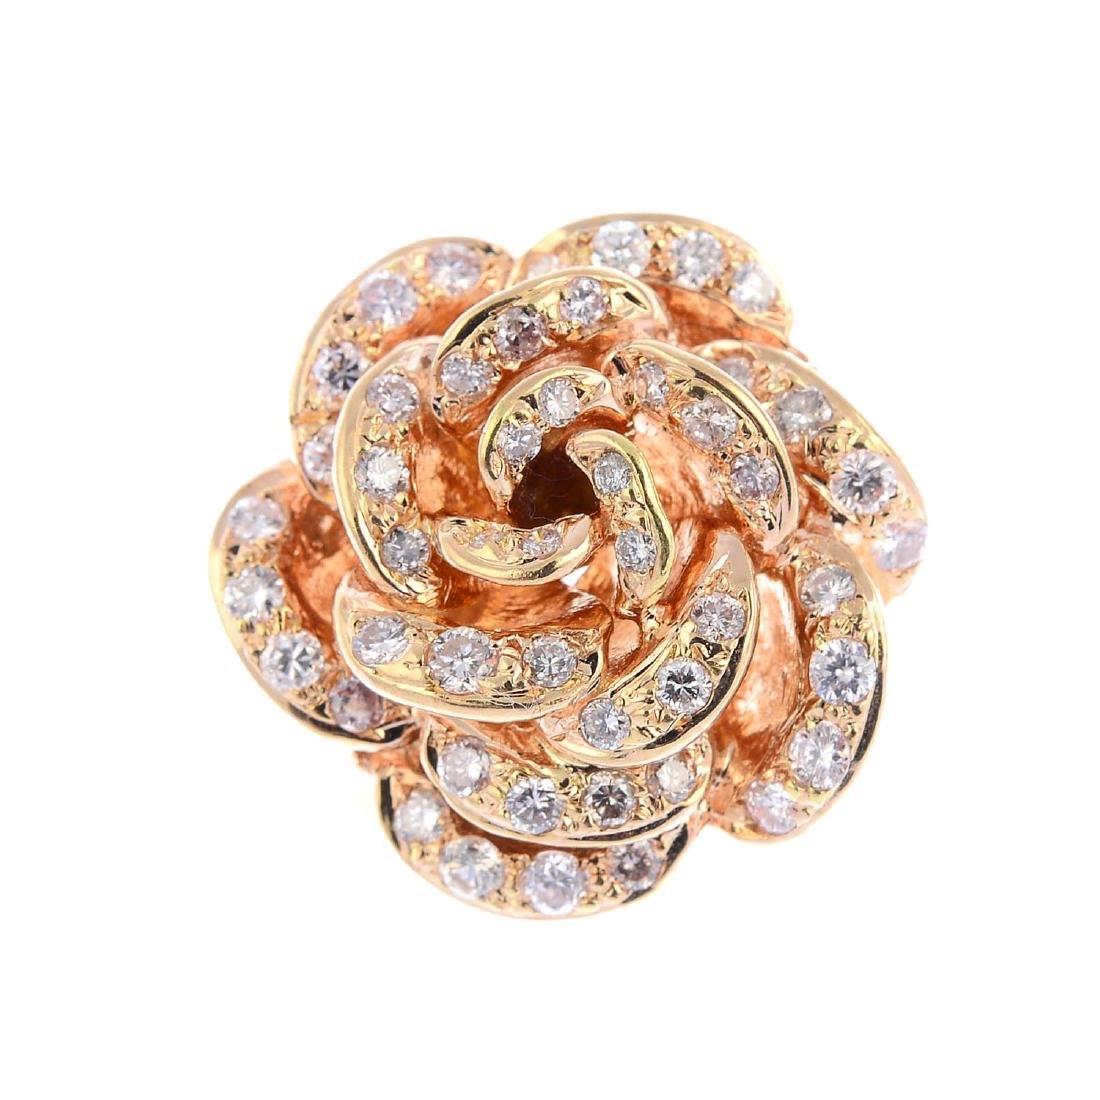 A diamond dress ring. Designed as a brilliant-cut